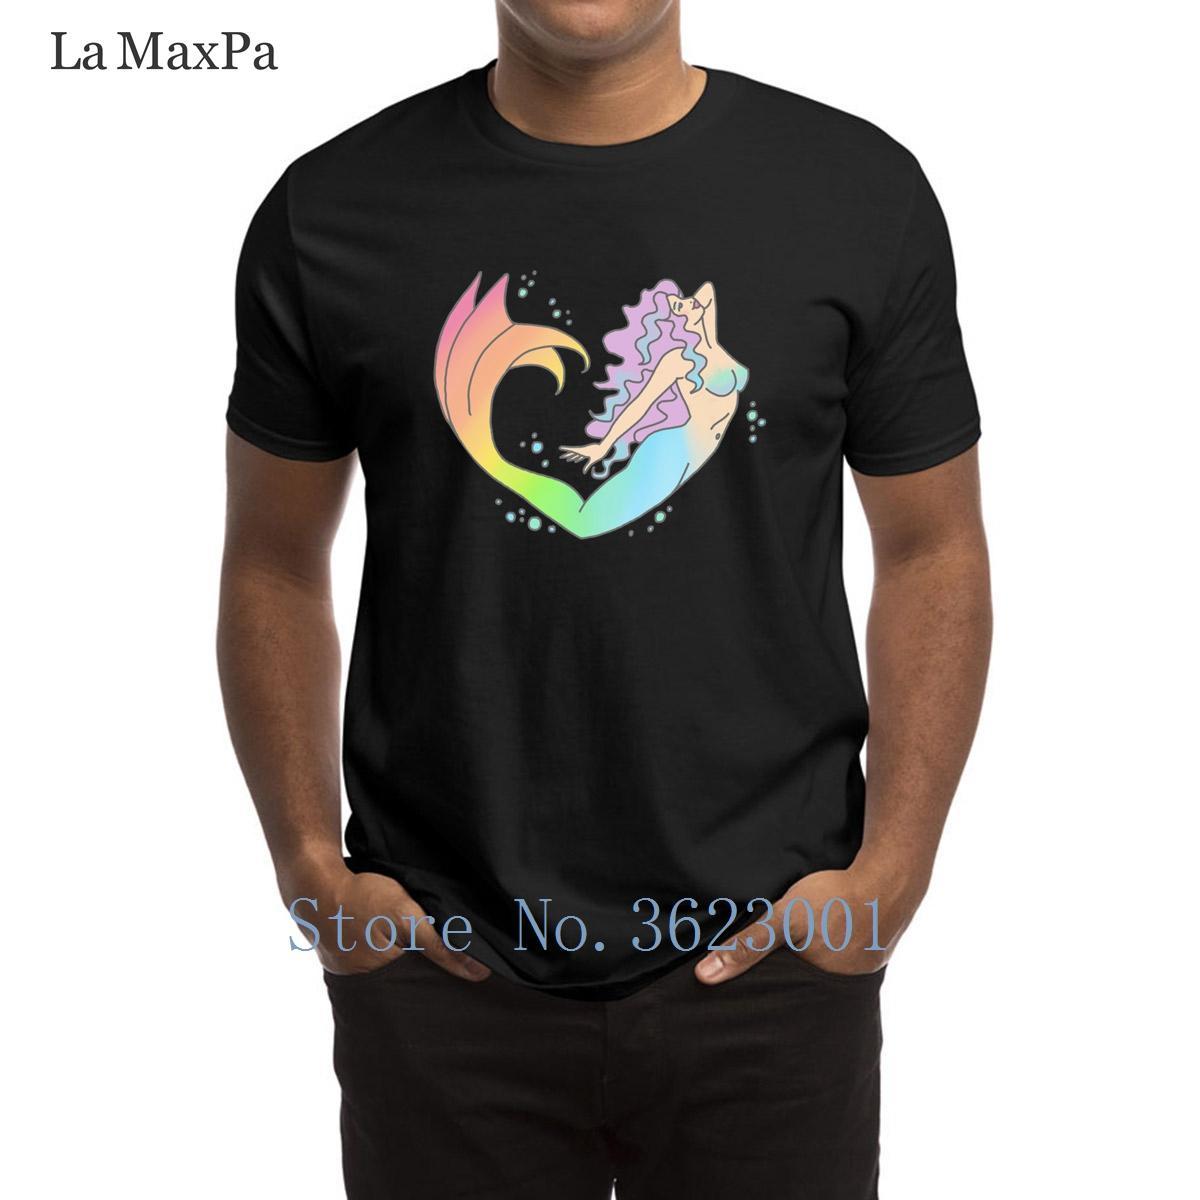 Letters t-shirt personalizado Camiseta Rainbow Magic Pastel feminino feminista Mermaid Quirky 2018 camiseta Man O Neck T-shirt para homens